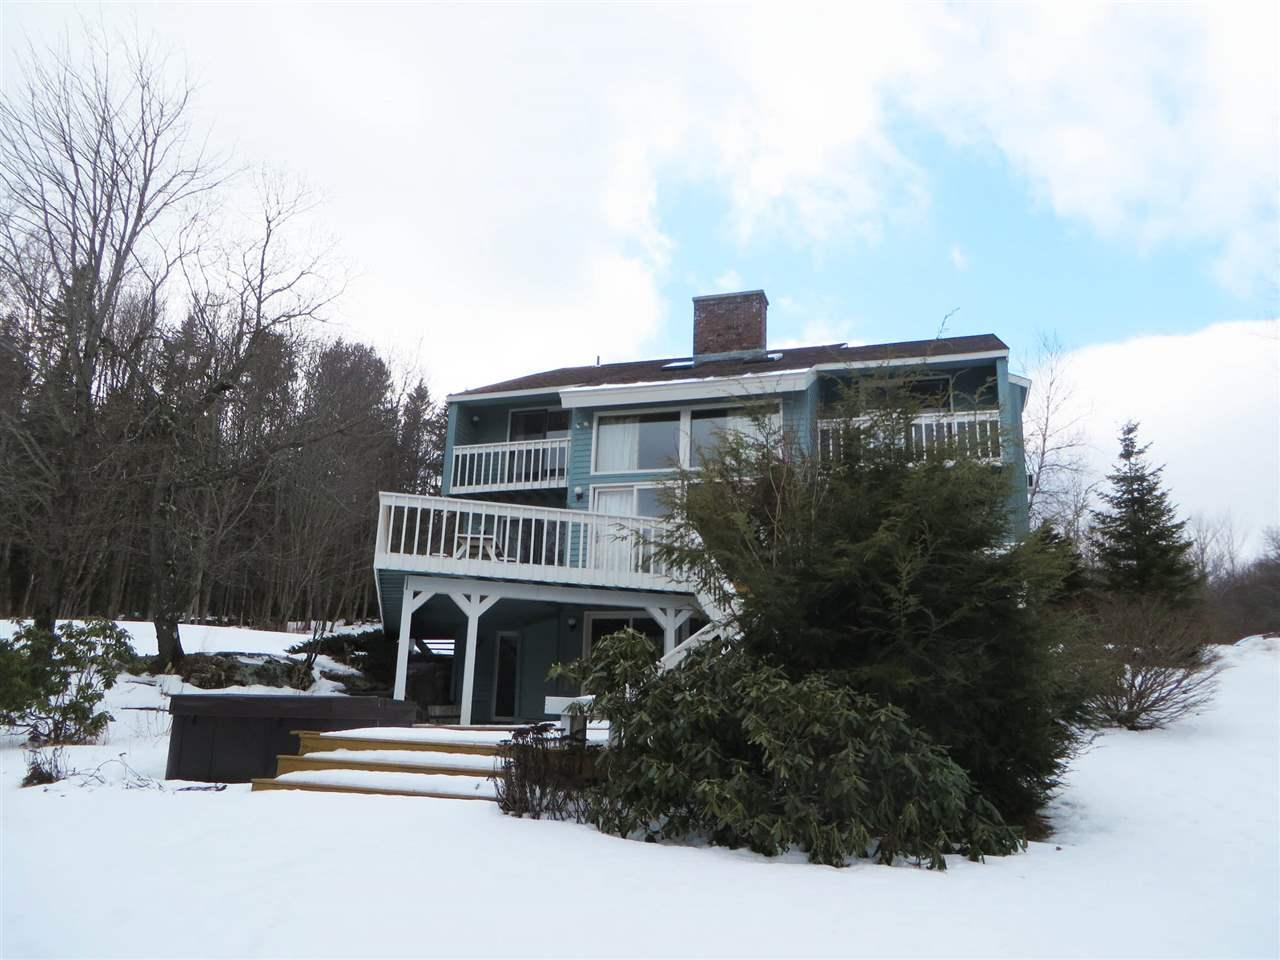 Mount-Snow-Real-Estate-4472536-3